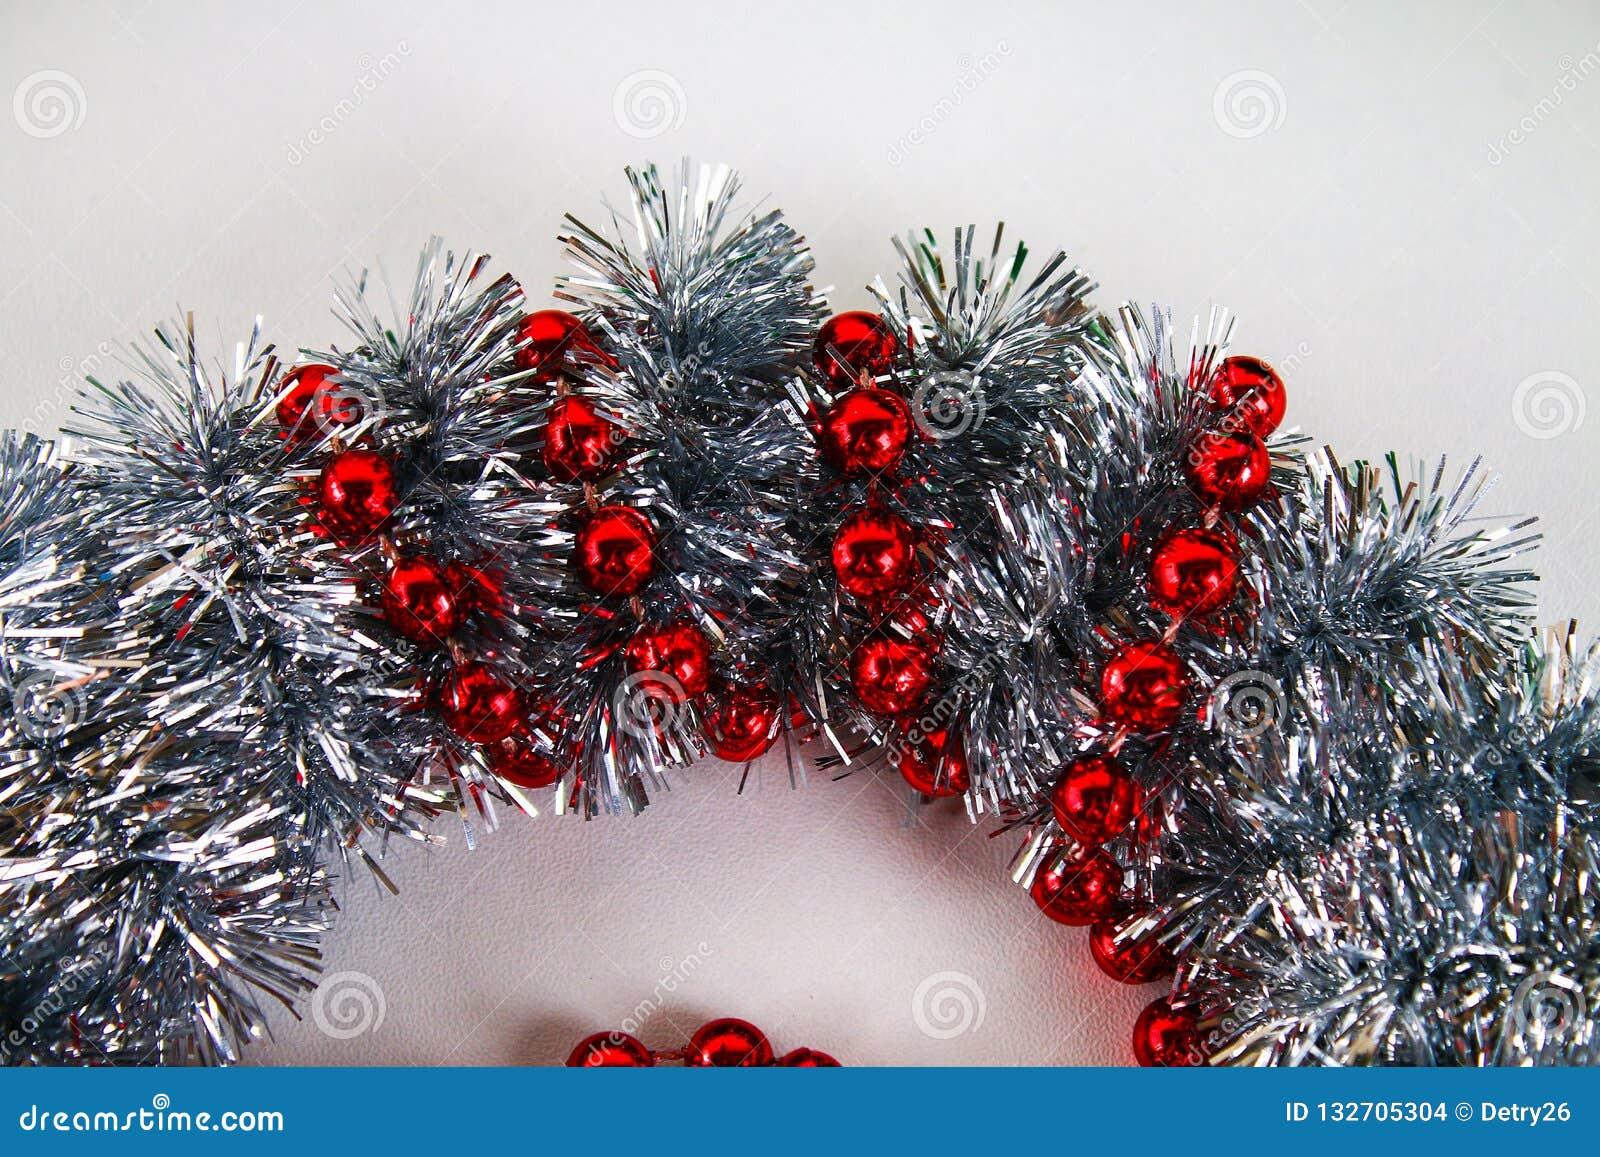 Diy圣诞节花圈 在照片的指南如何由纸板板材,闪亮金属片,小珠做圣诞节花圈用您自己的手